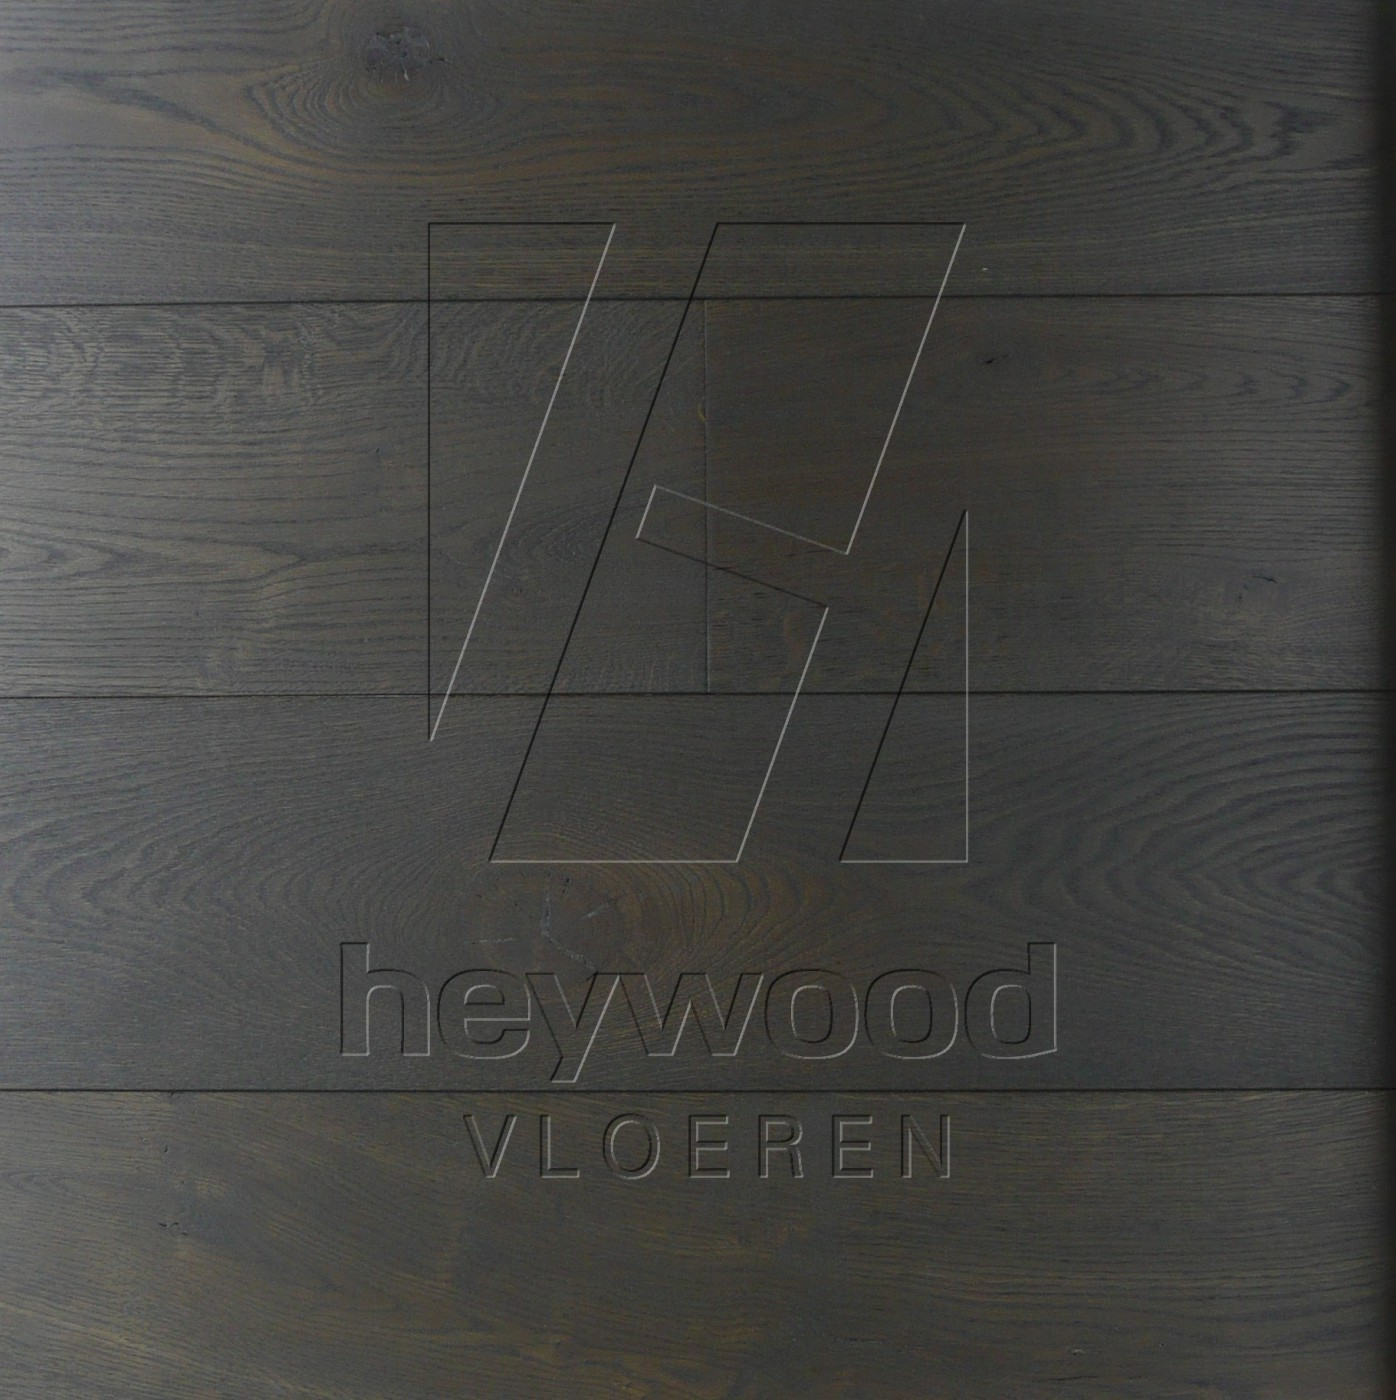 Trondheim in European Oak Character of Bespoke Wooden Floors